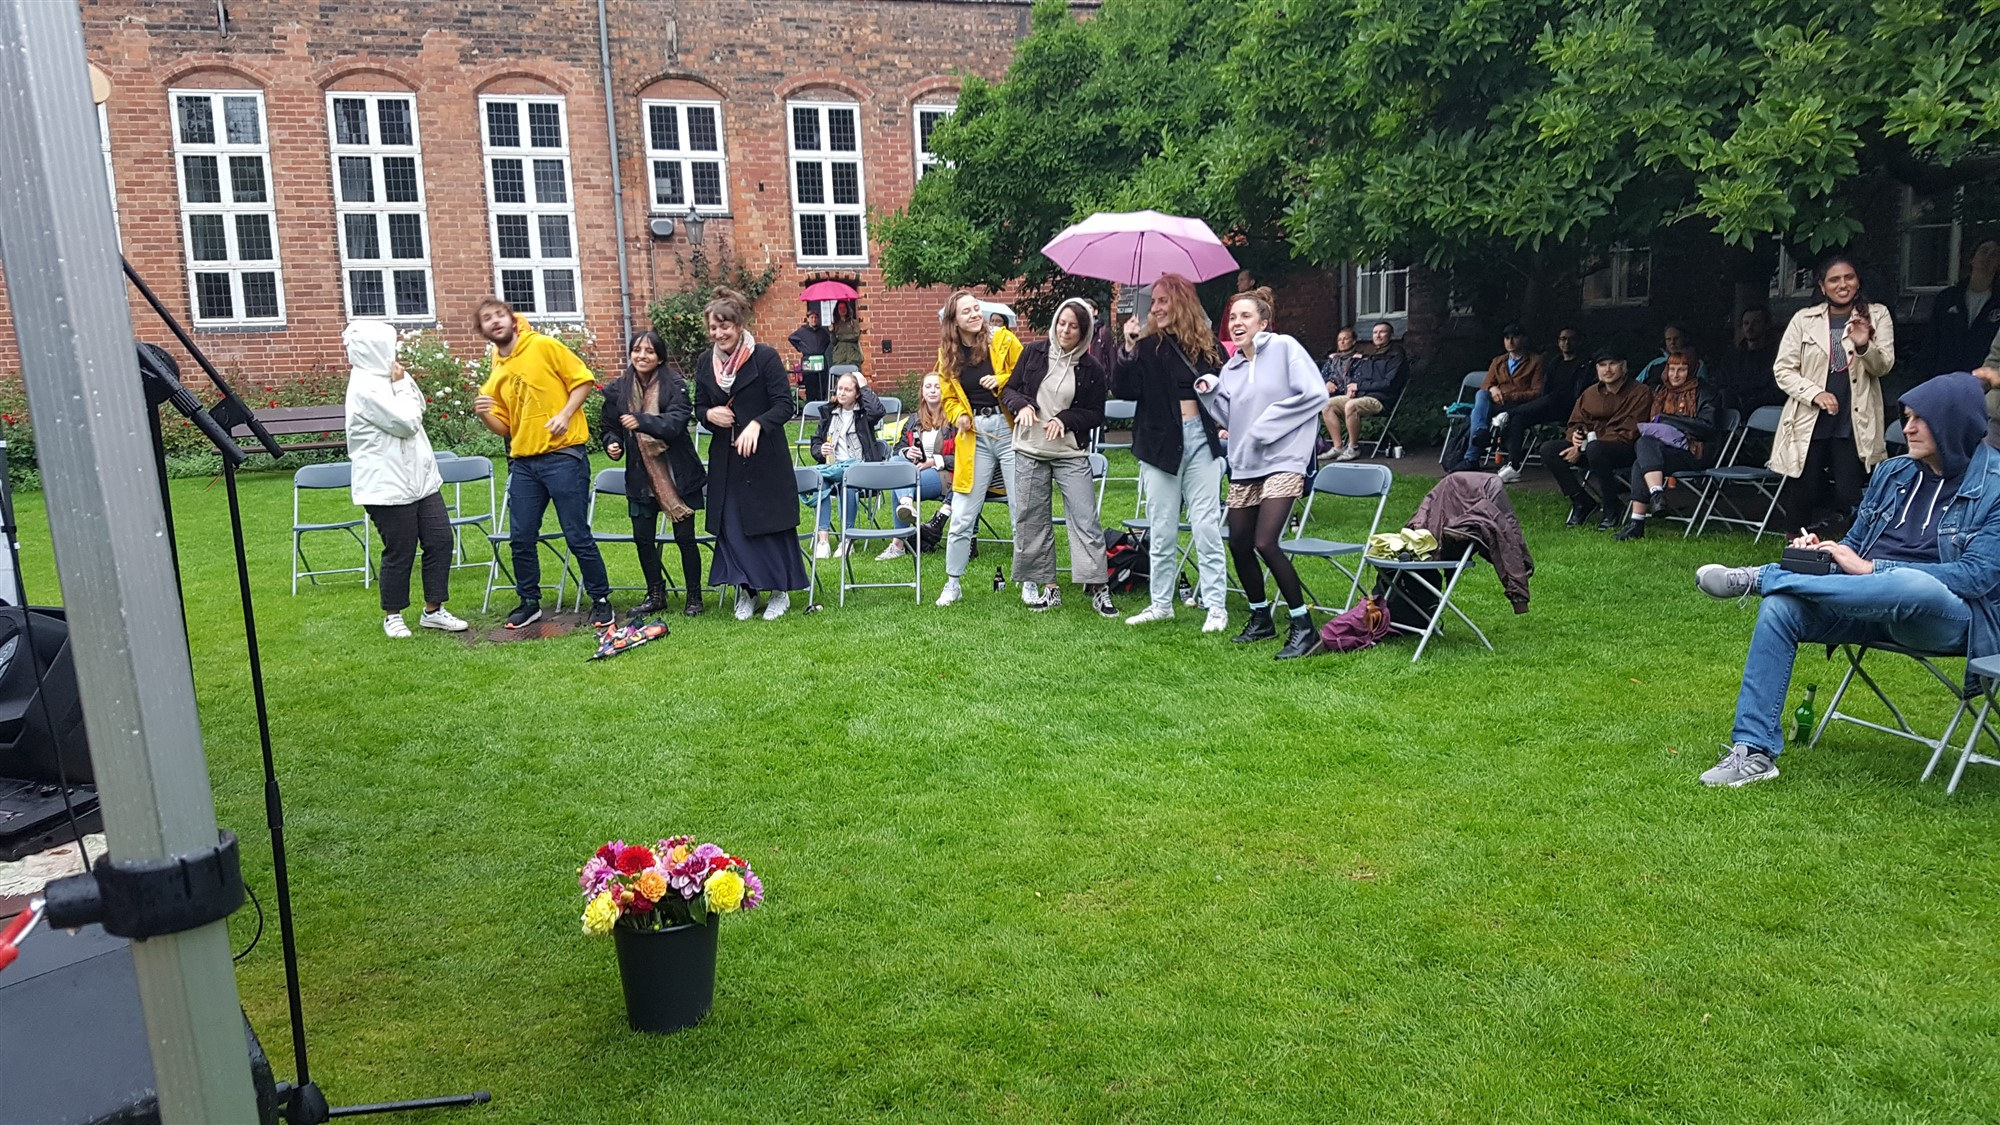 2021-08-28_Rathausgarten-Sommerfestival (25)